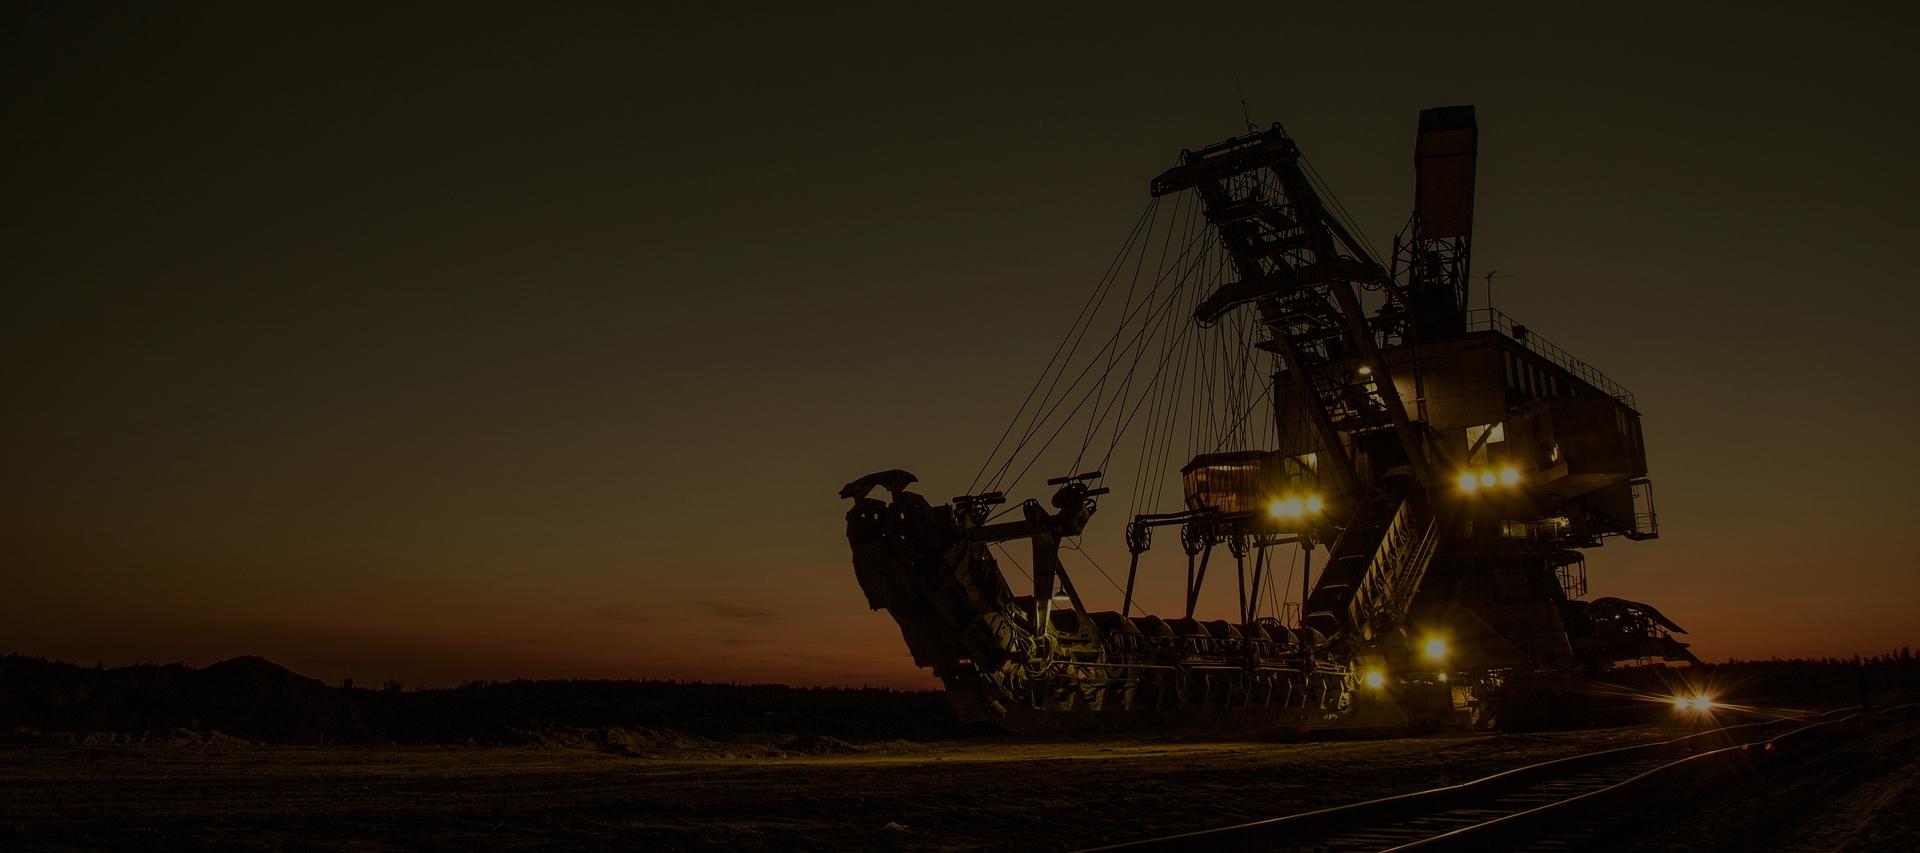 mining-excavator-1736289_1920_2